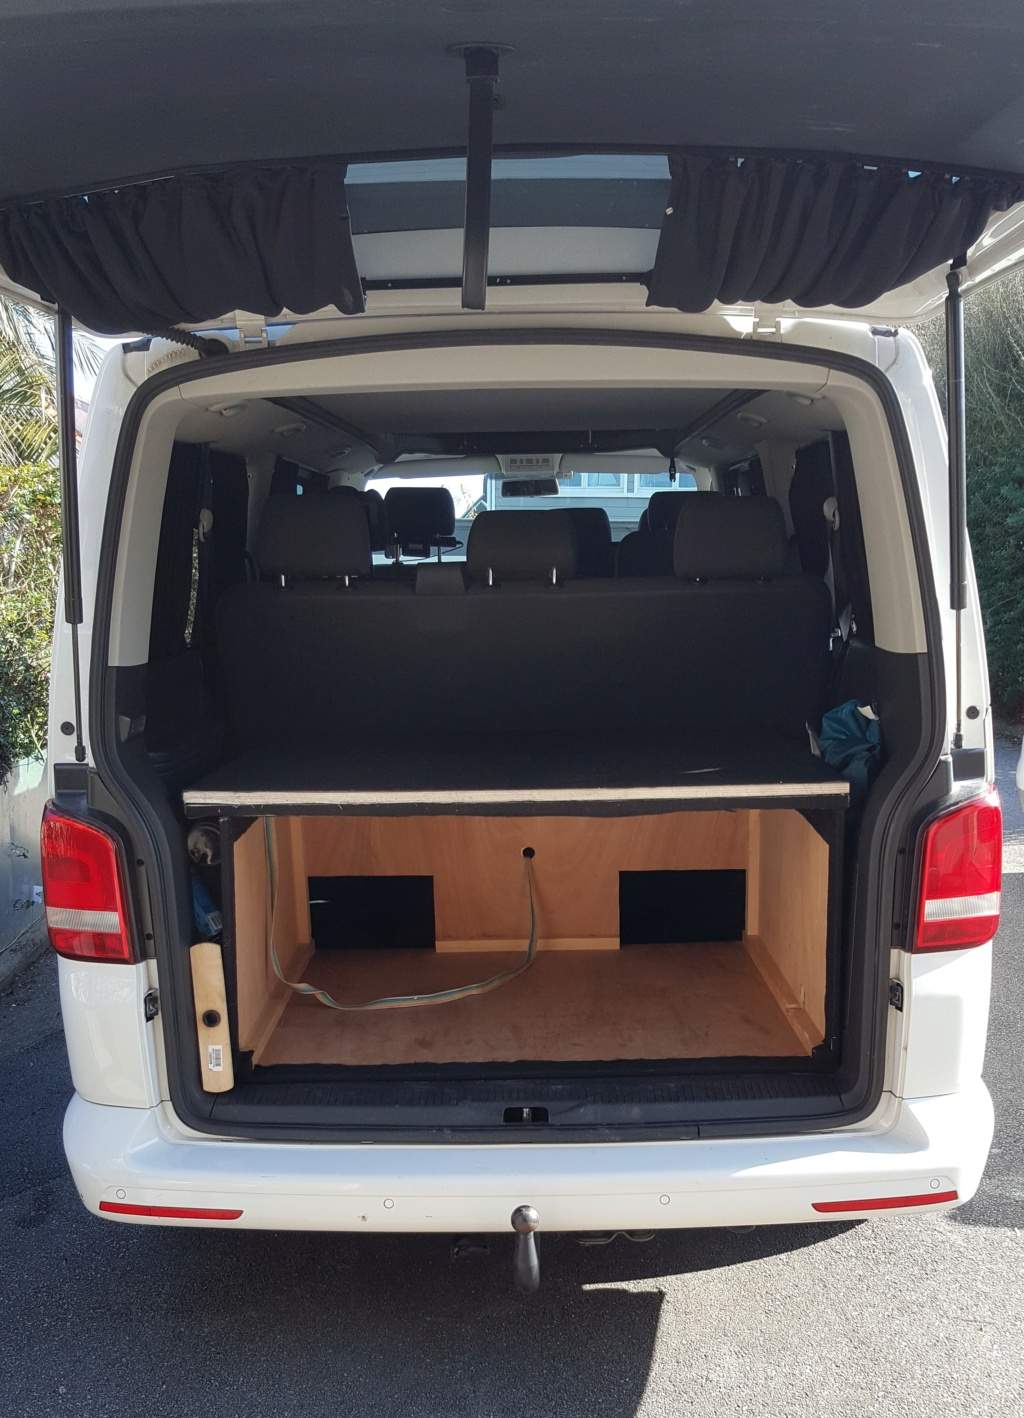 Vends T5 Caravelle Long 2014 (2.0L, 114cv) reprog 174CV avec Toit Reimo 29 900€ 310